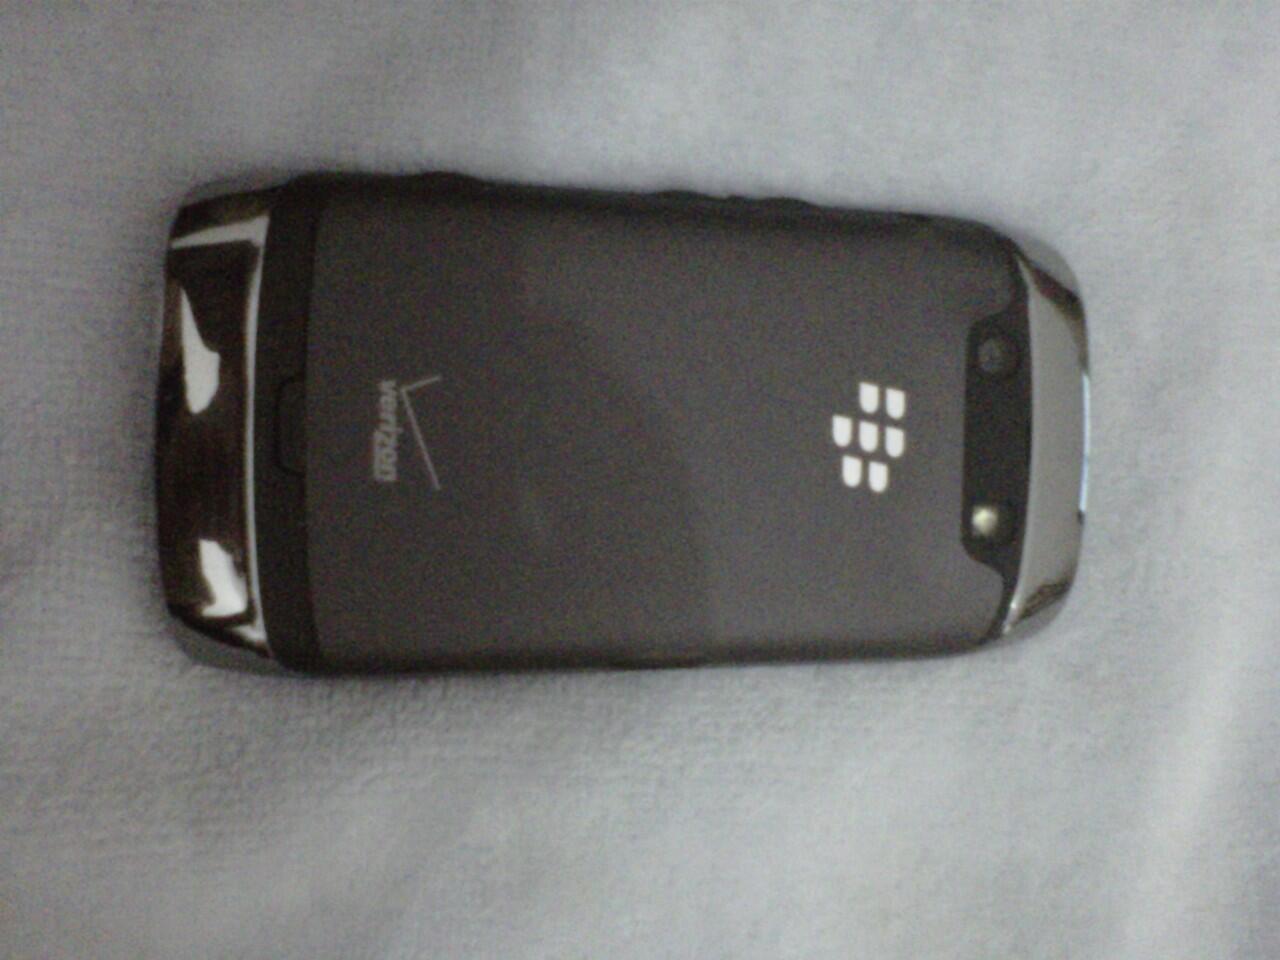 jual Blackberry MONACO kembaran MONZA bandung